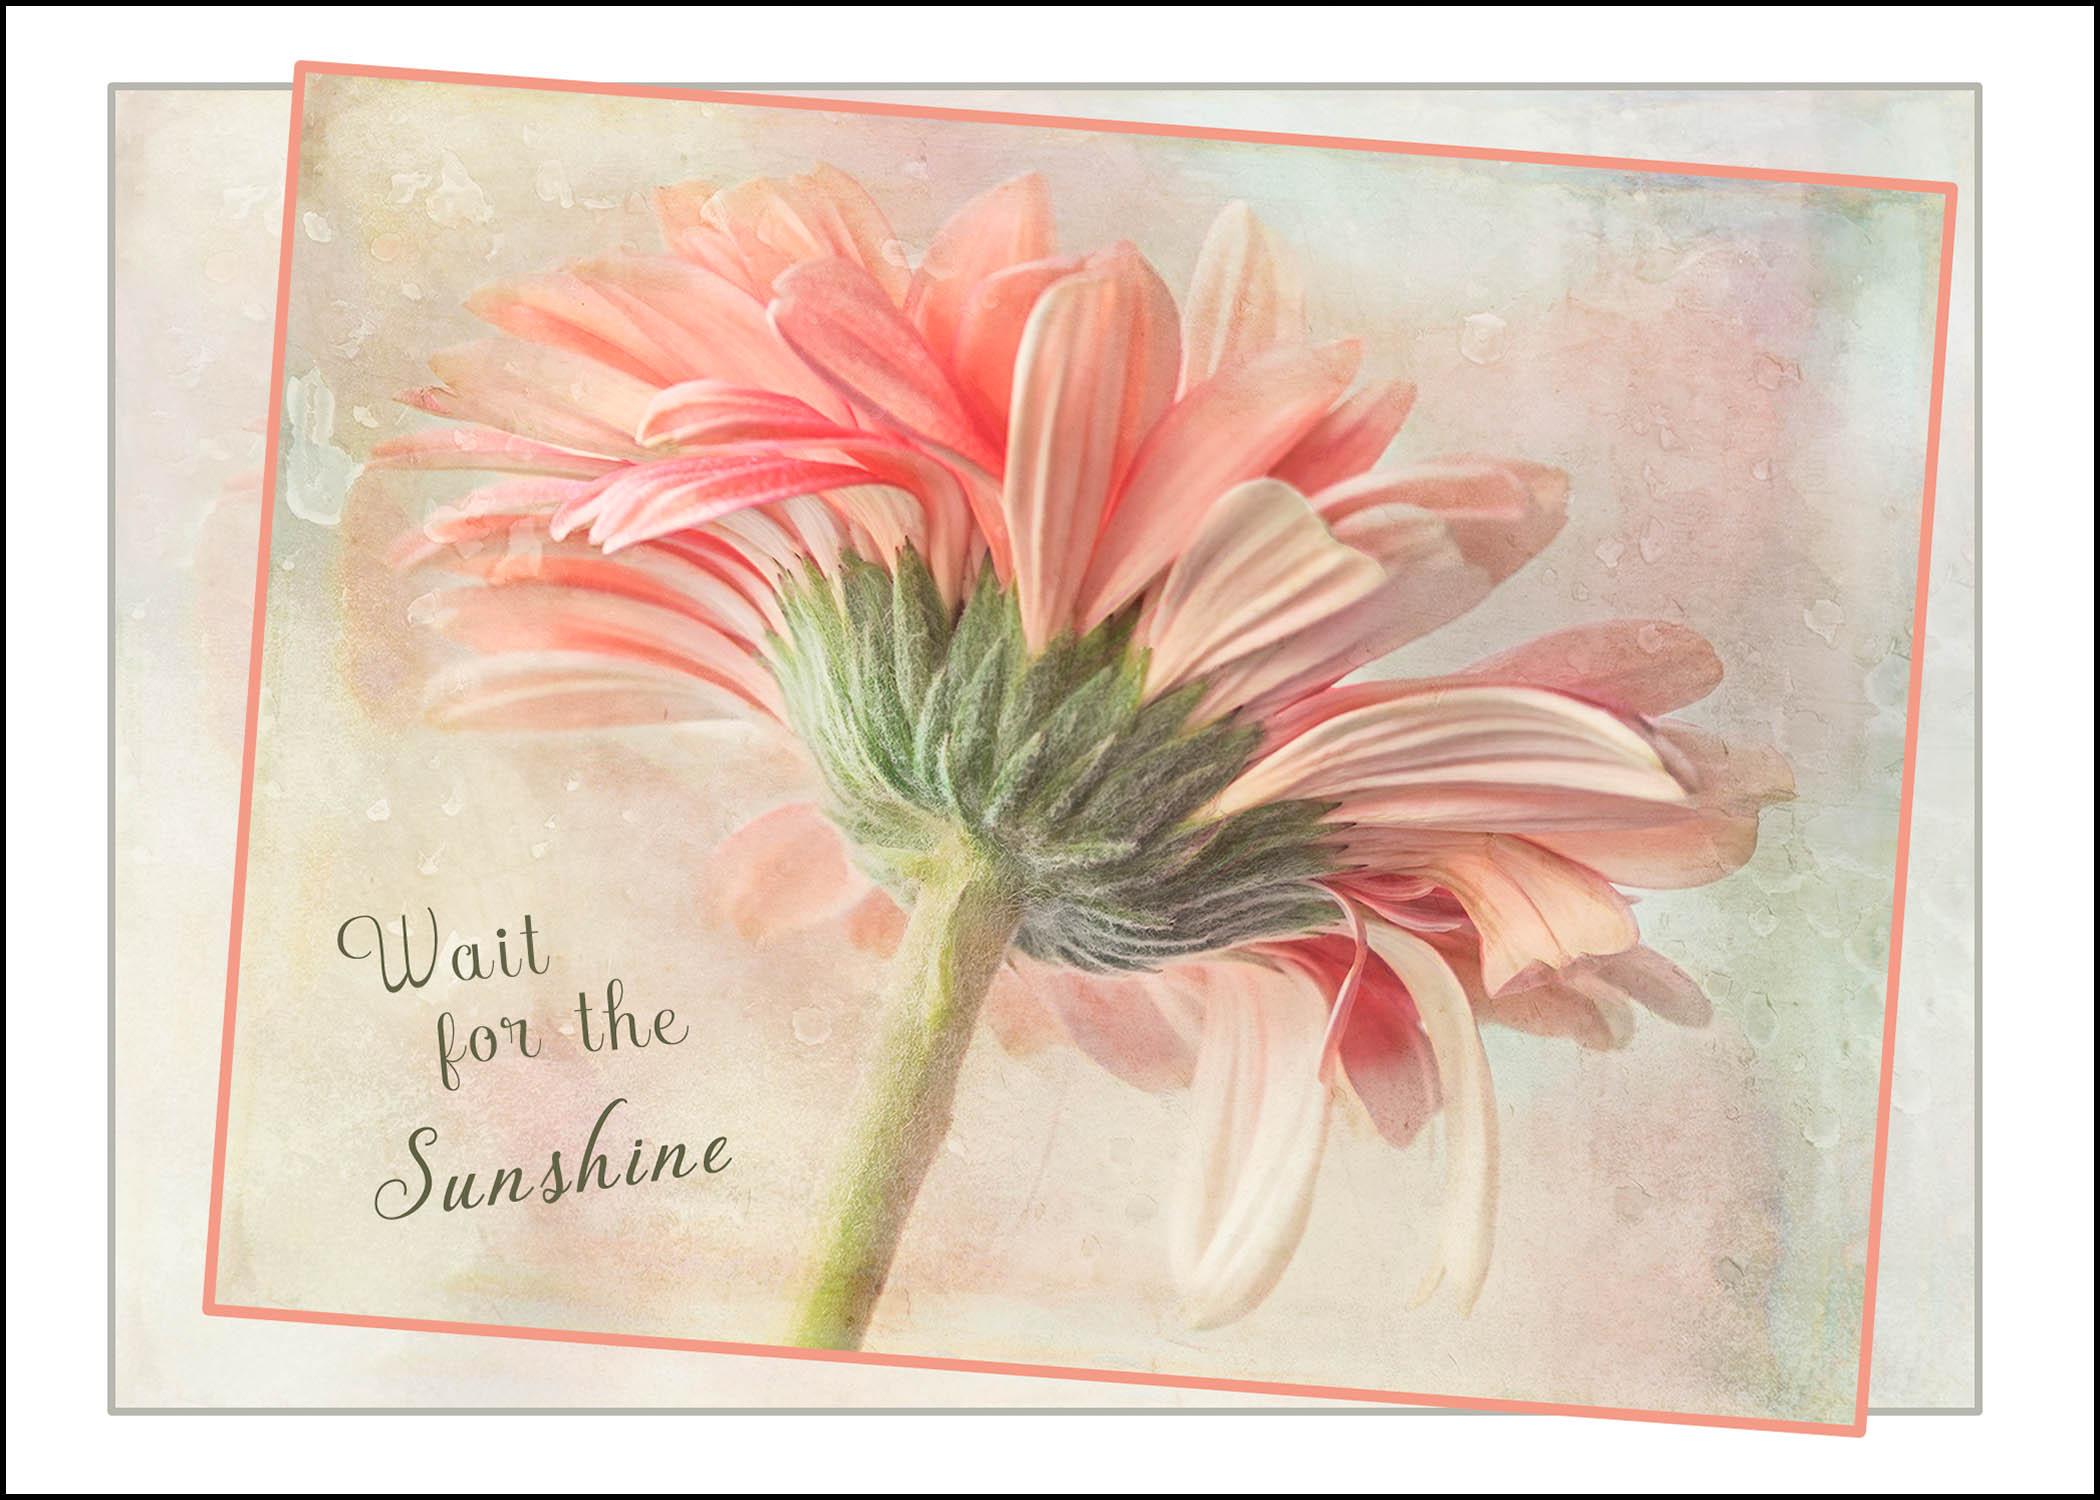 Wait for the Sunshine